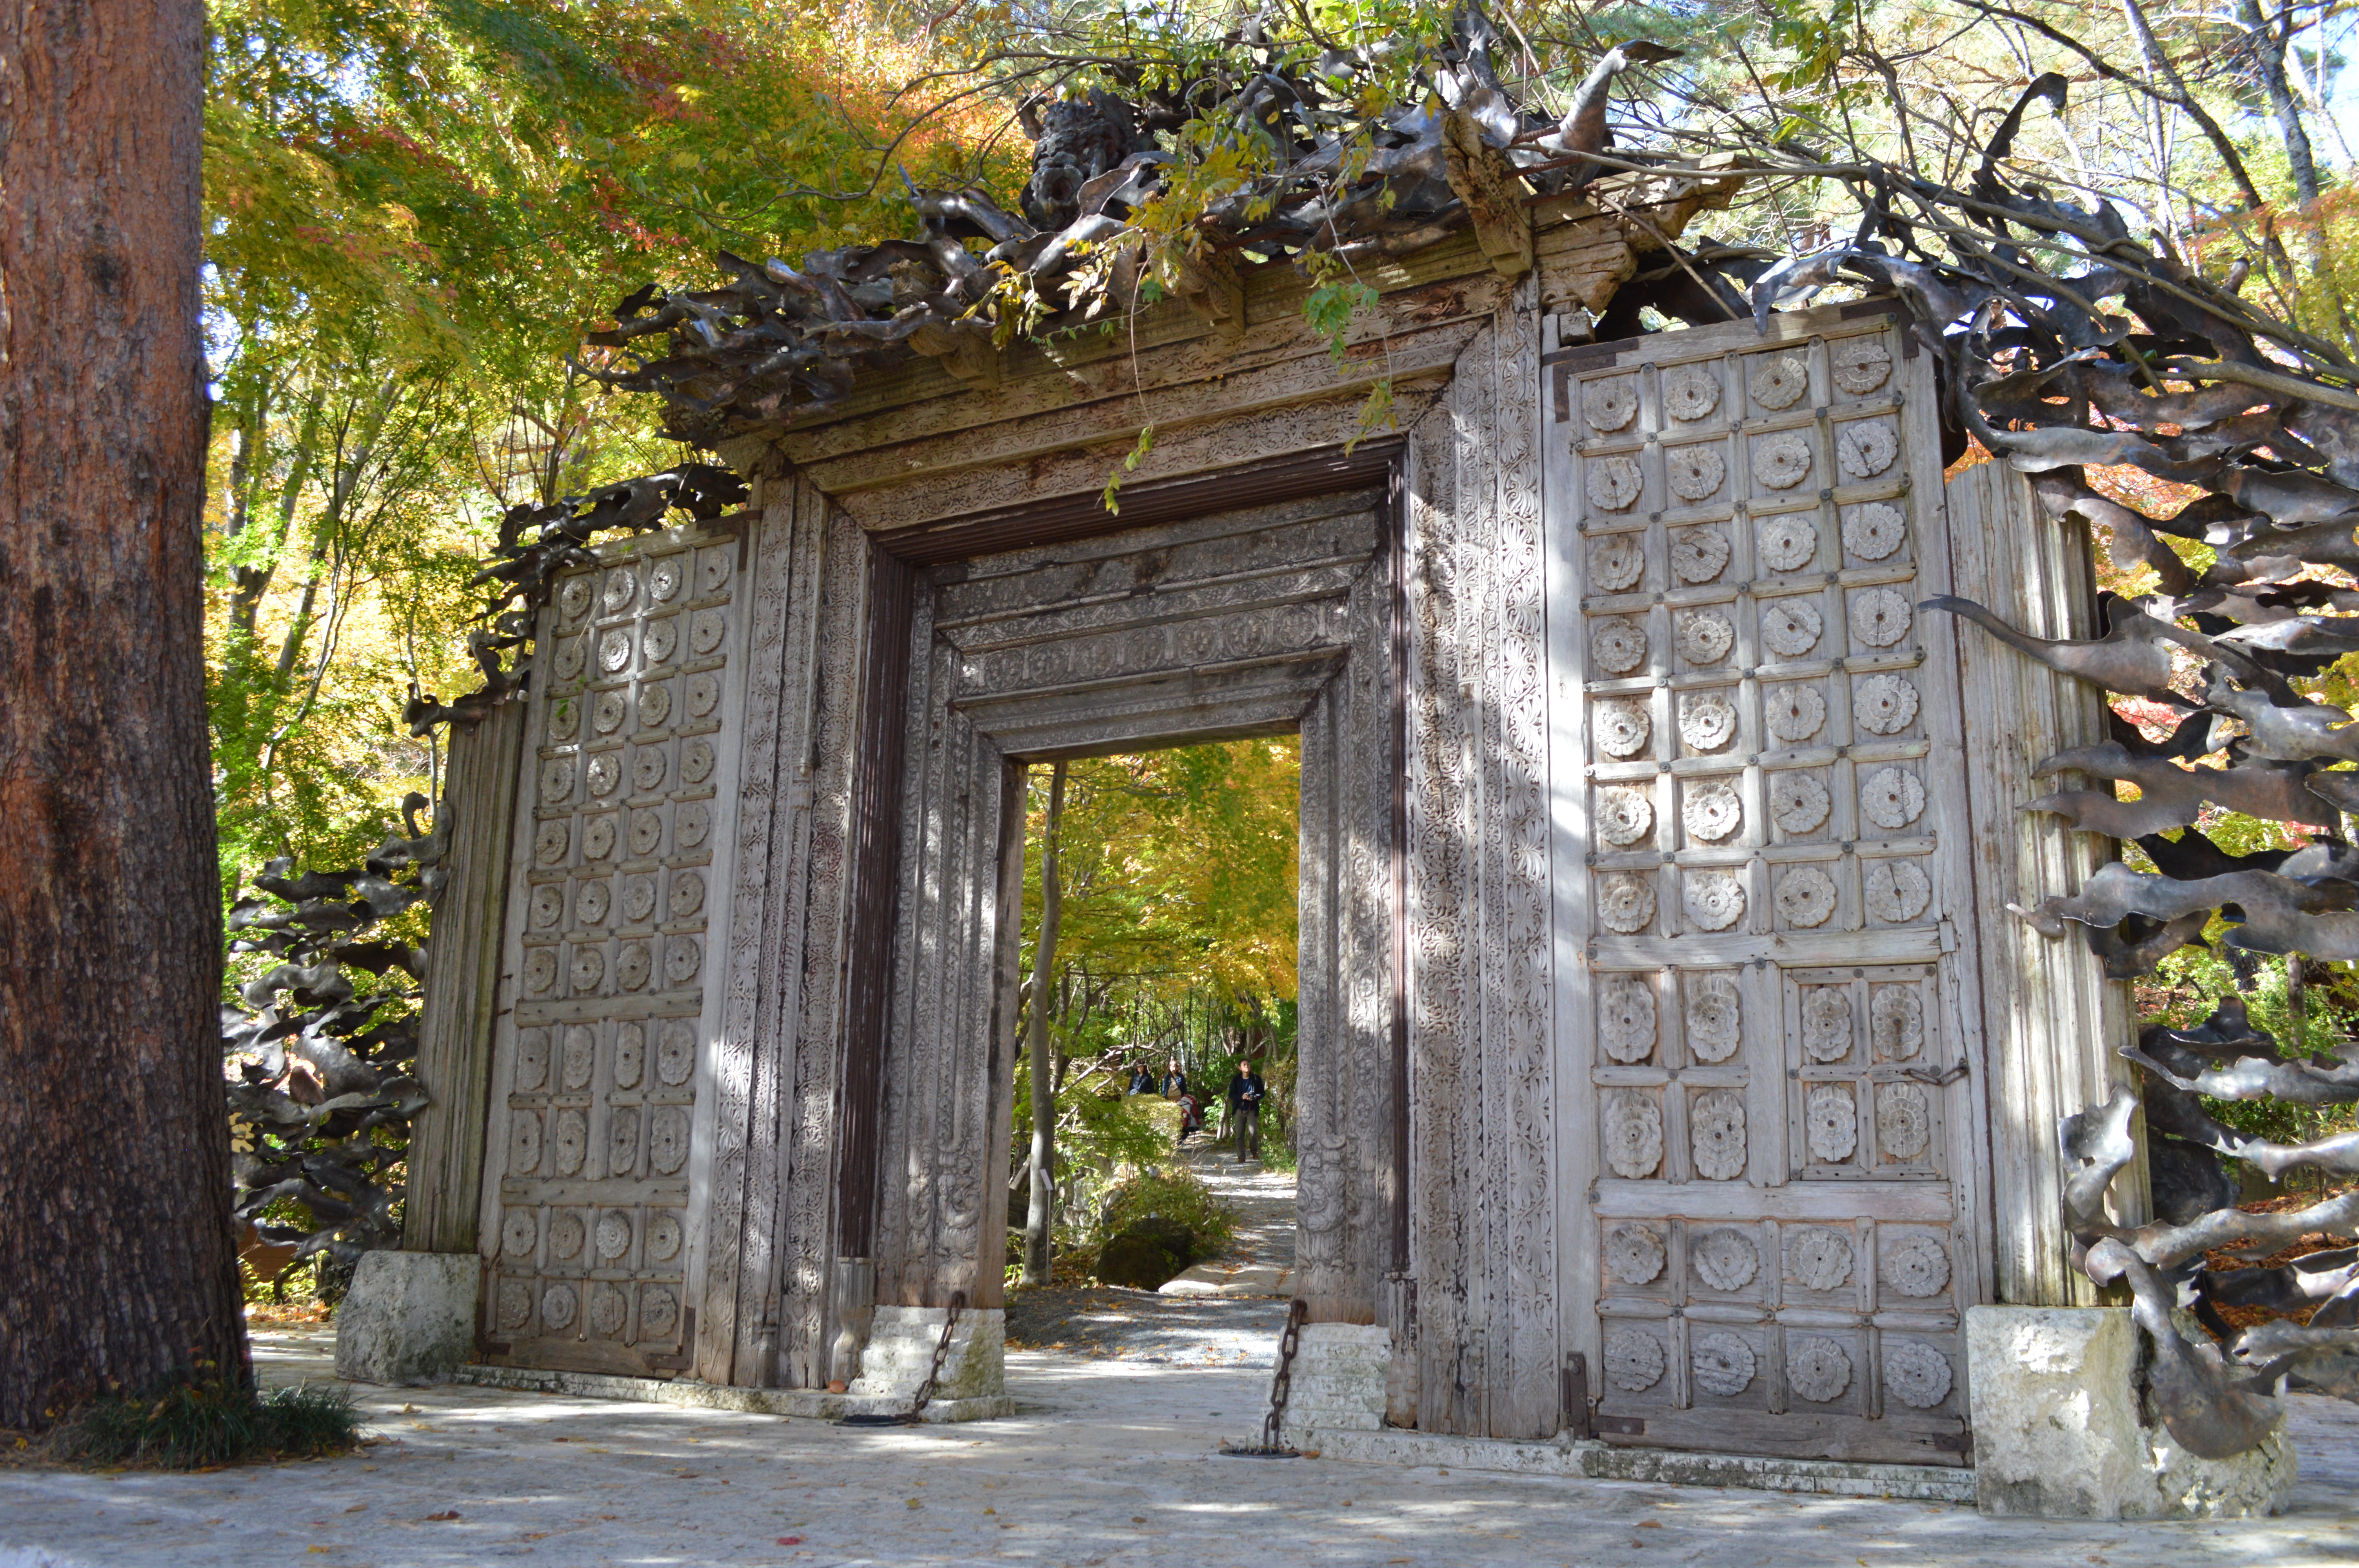 The entrance to the Itchiku Kubota Art Museum